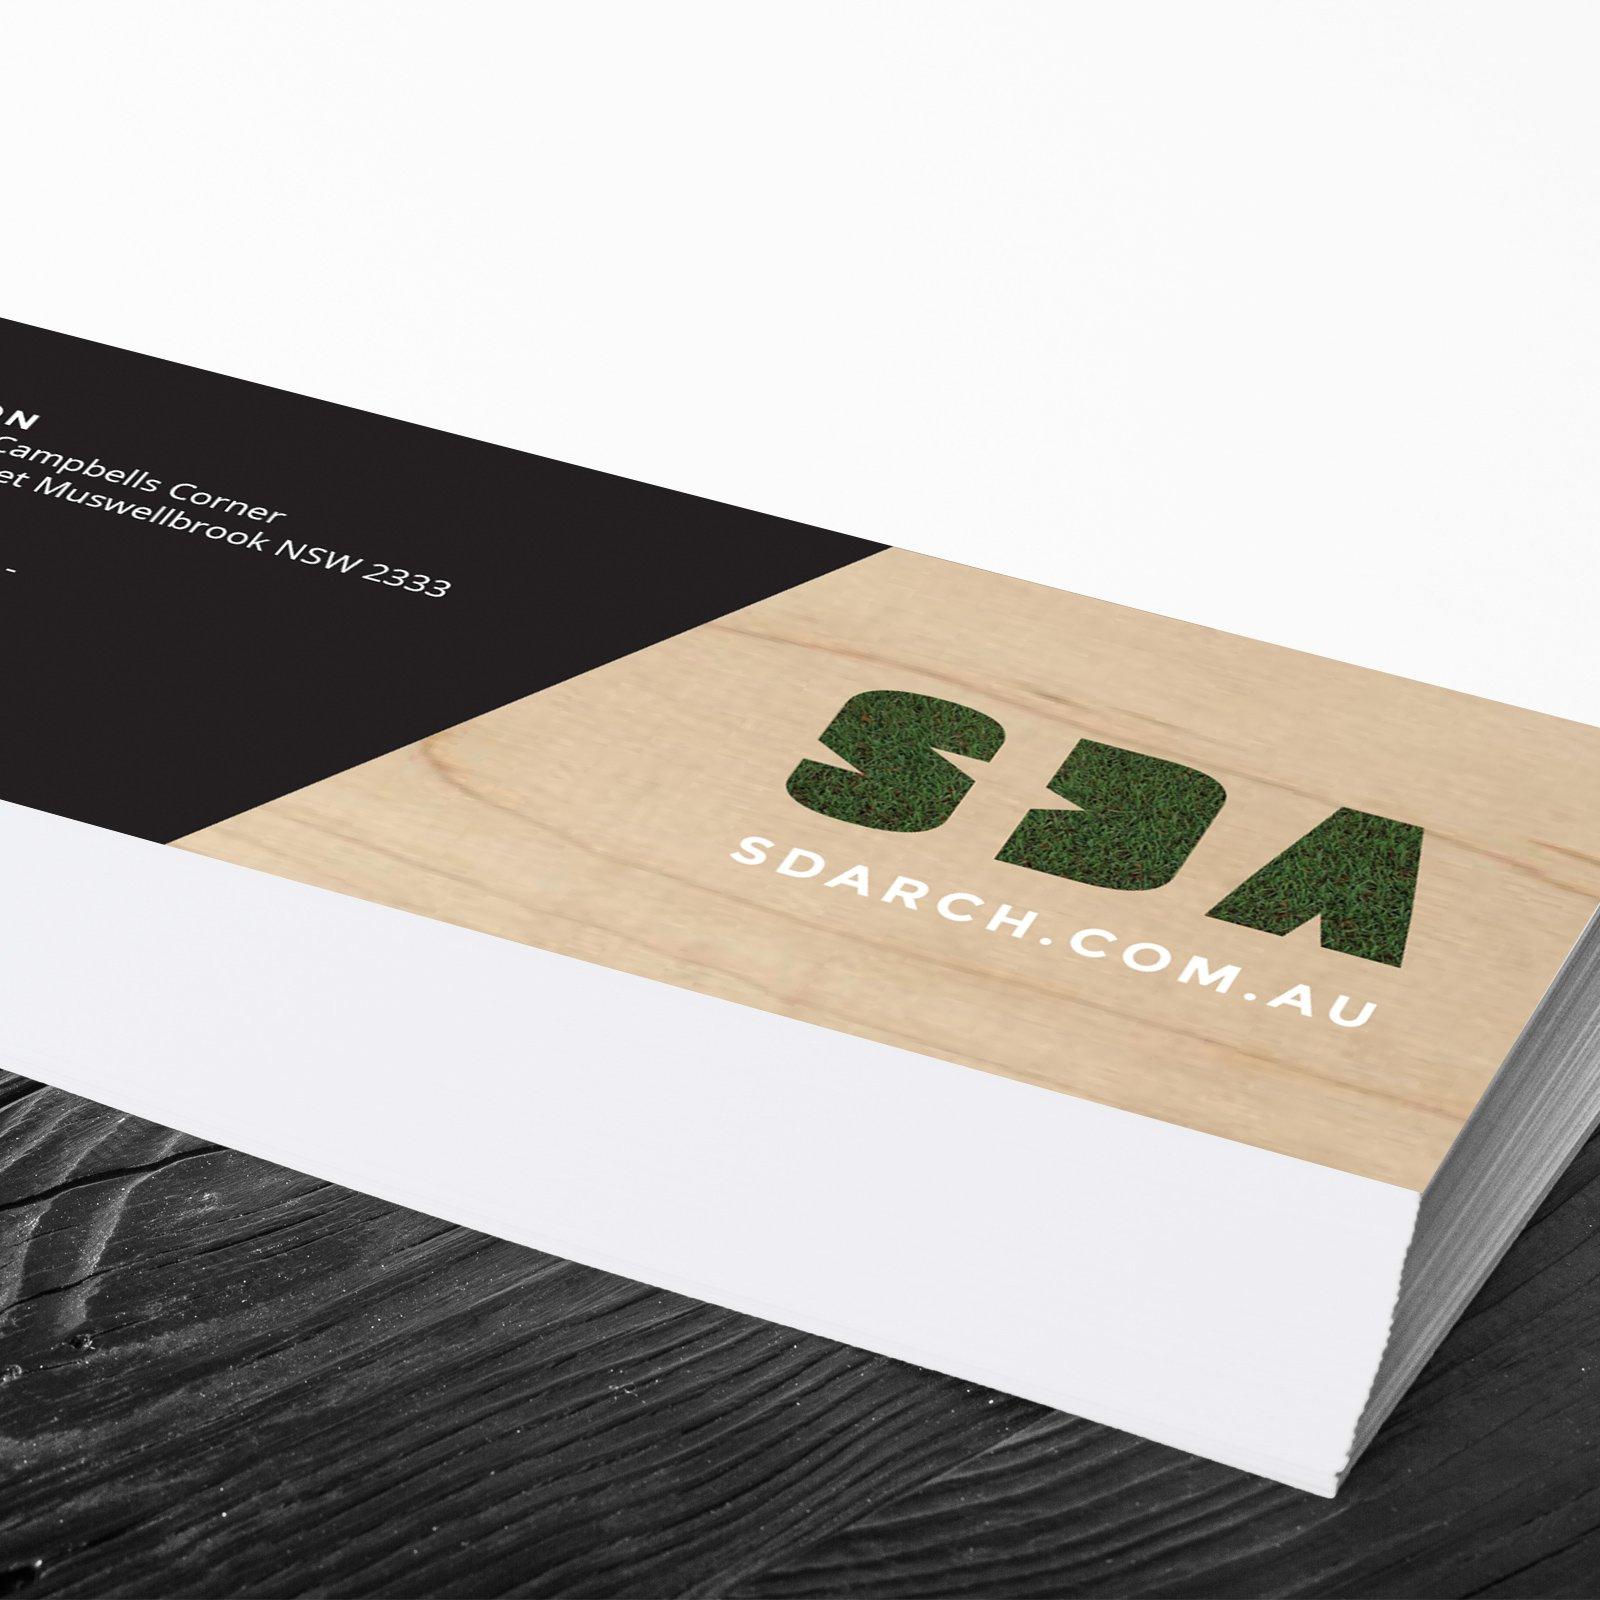 SDA Title Block